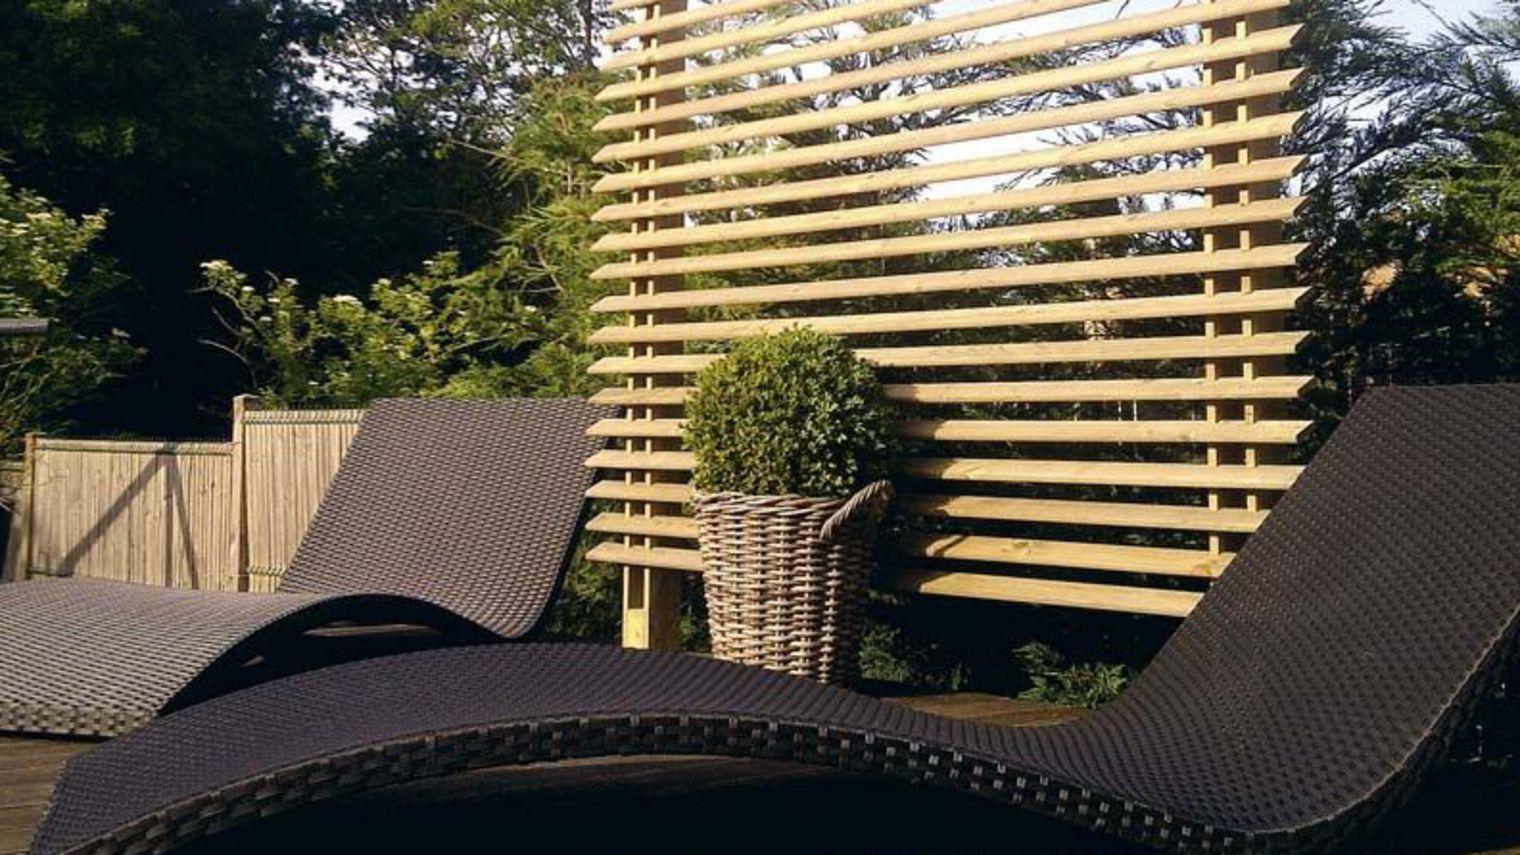 Afficher l\'image d\'origine | jardin / terrasse | Pinterest ...